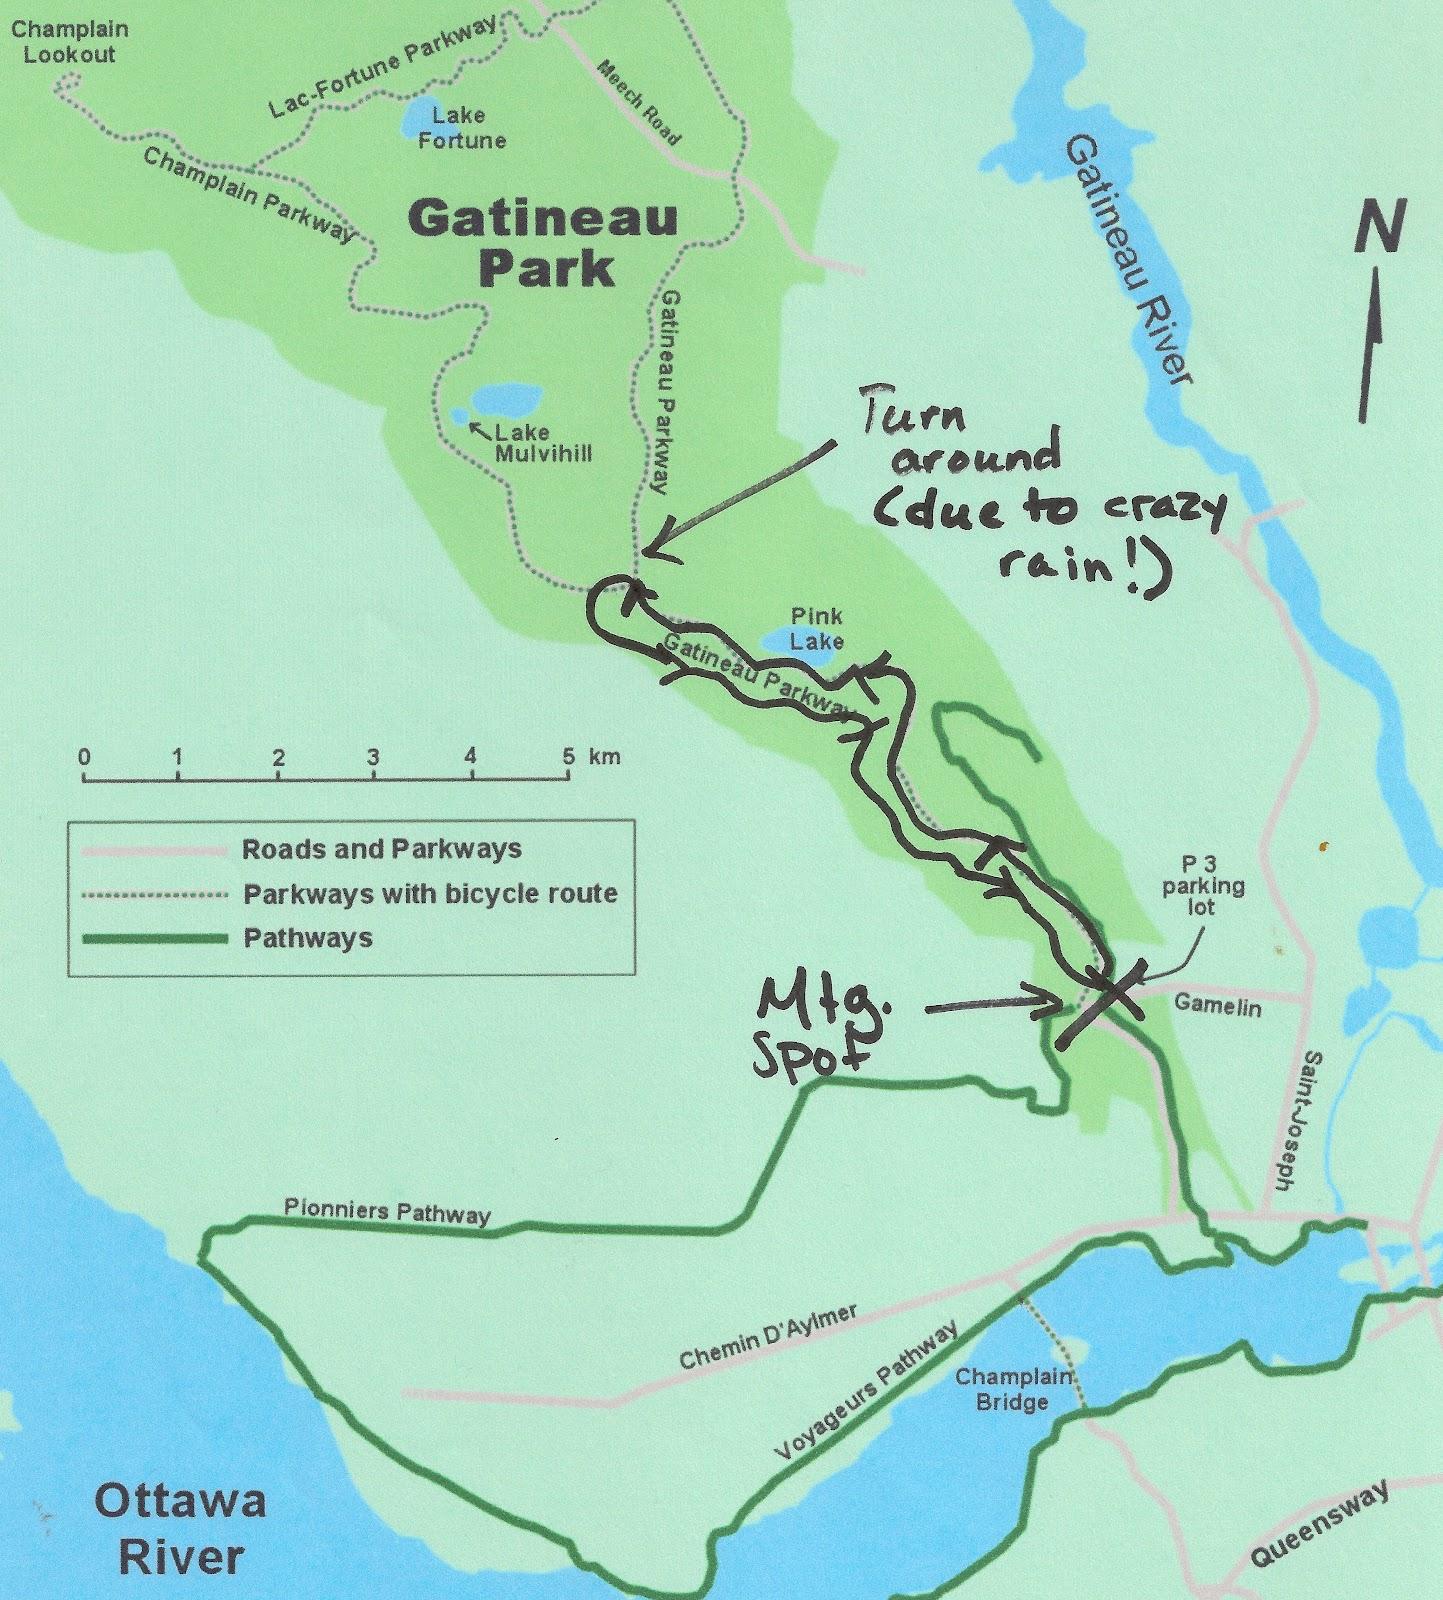 http://2.bp.blogspot.com/-MMPcoo06nd8/T9YTWoGcQII/AAAAAAAABRI/Q_l47hBSLBM/s1600/Gatineau+Park+Map2.jpeg